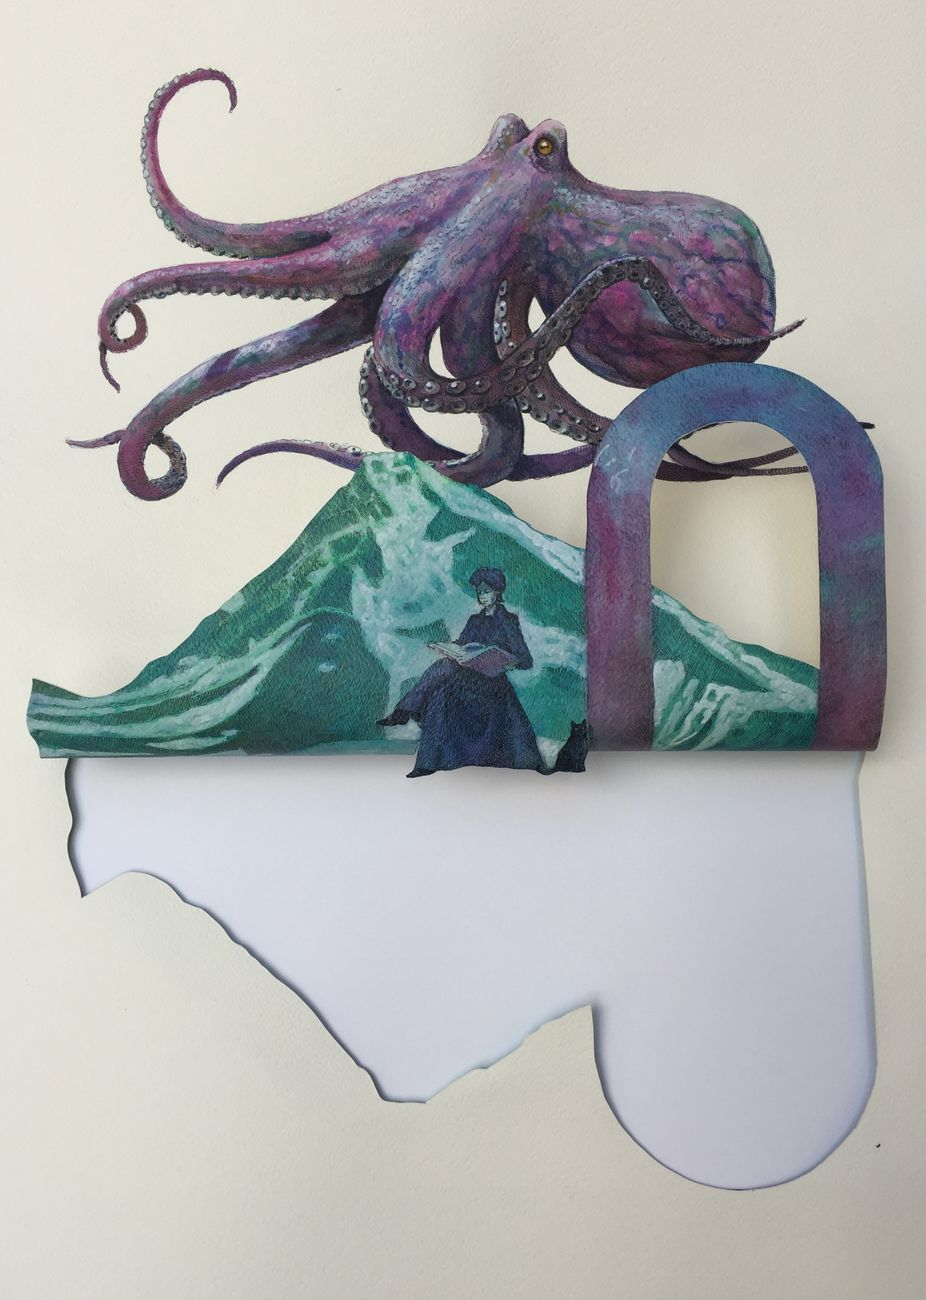 Vanni Cuoghi, Fondali oceanici 5 (Piovra Mont Gelé), 2021, cm 62x46, acrilico e china su carta